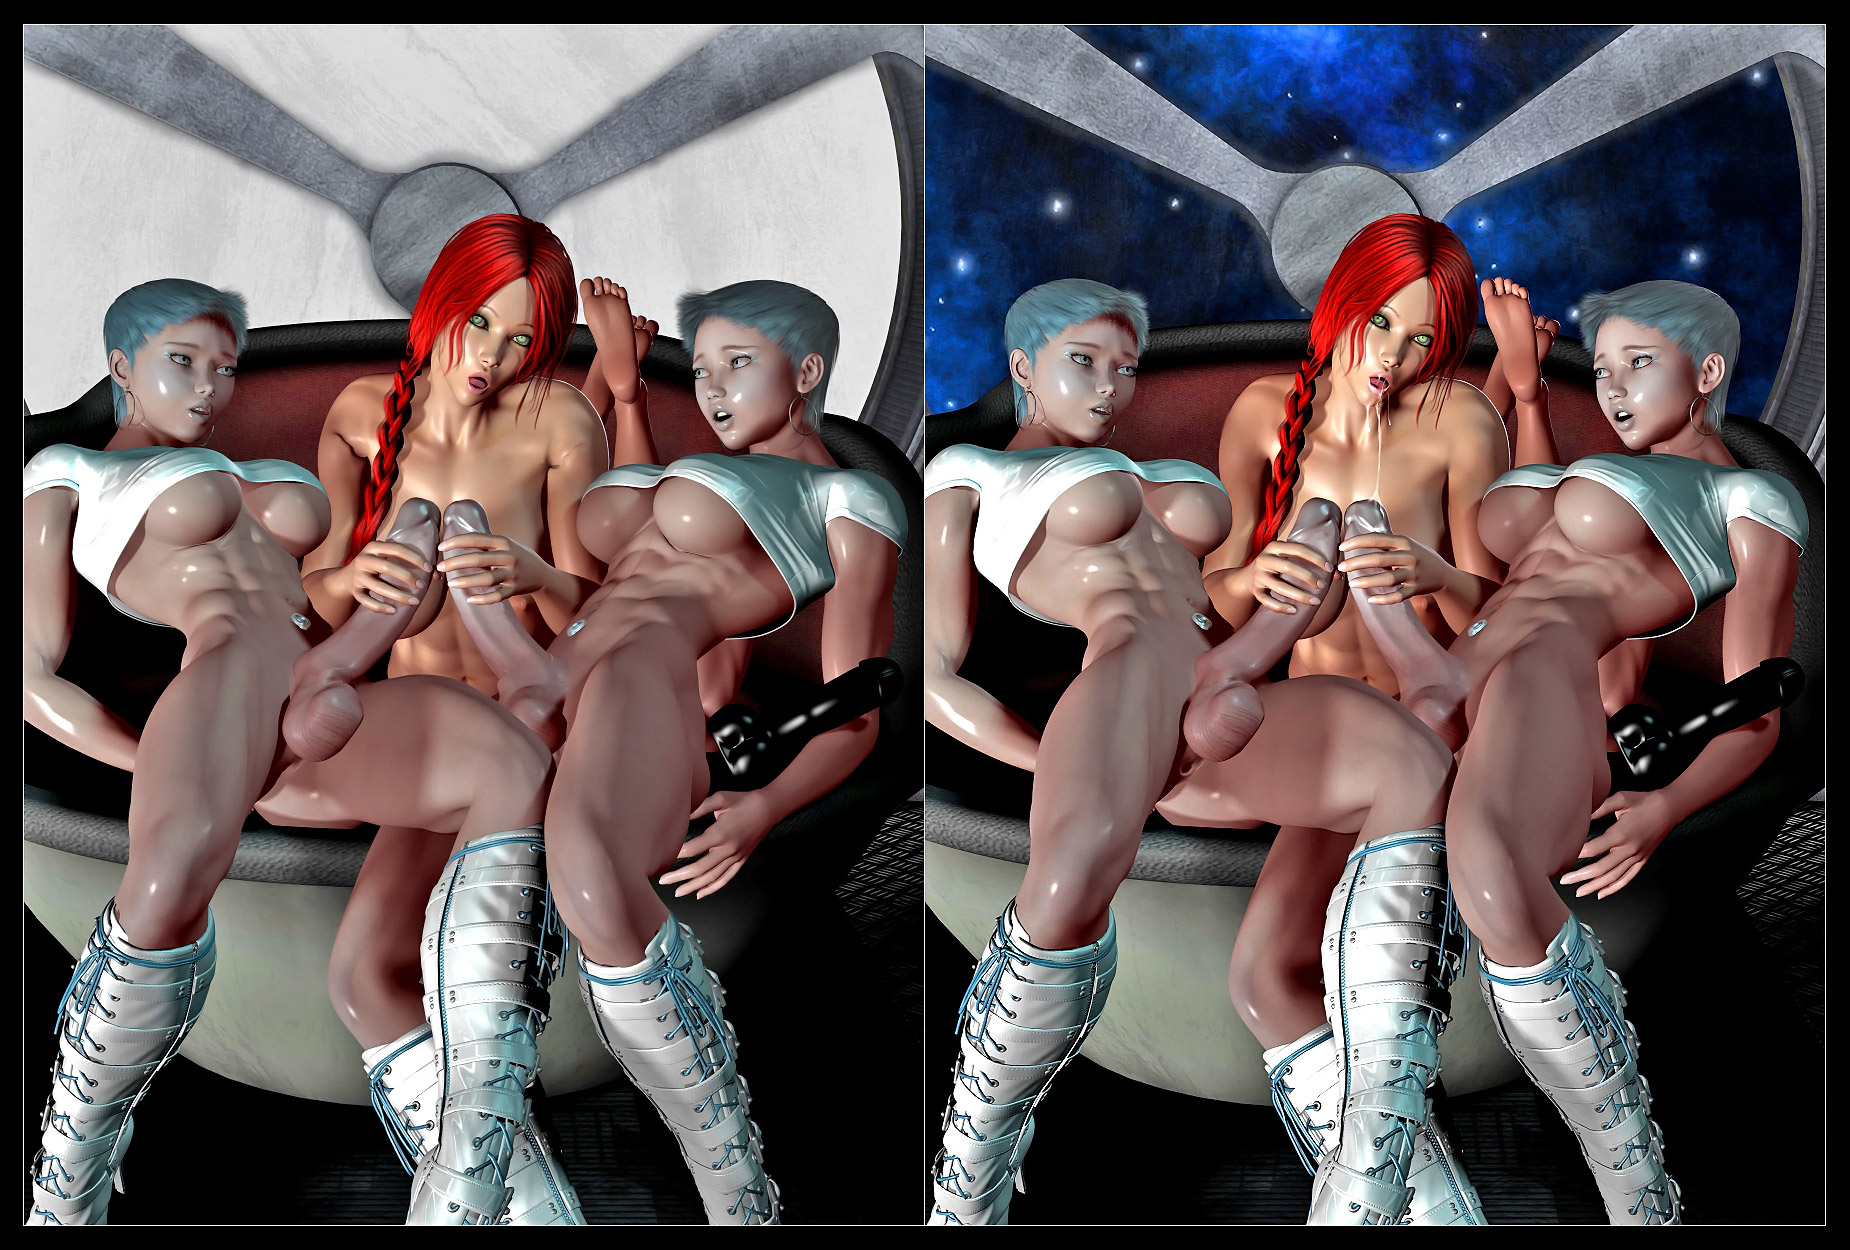 Free3d monster porn vidyosu fucks scenes